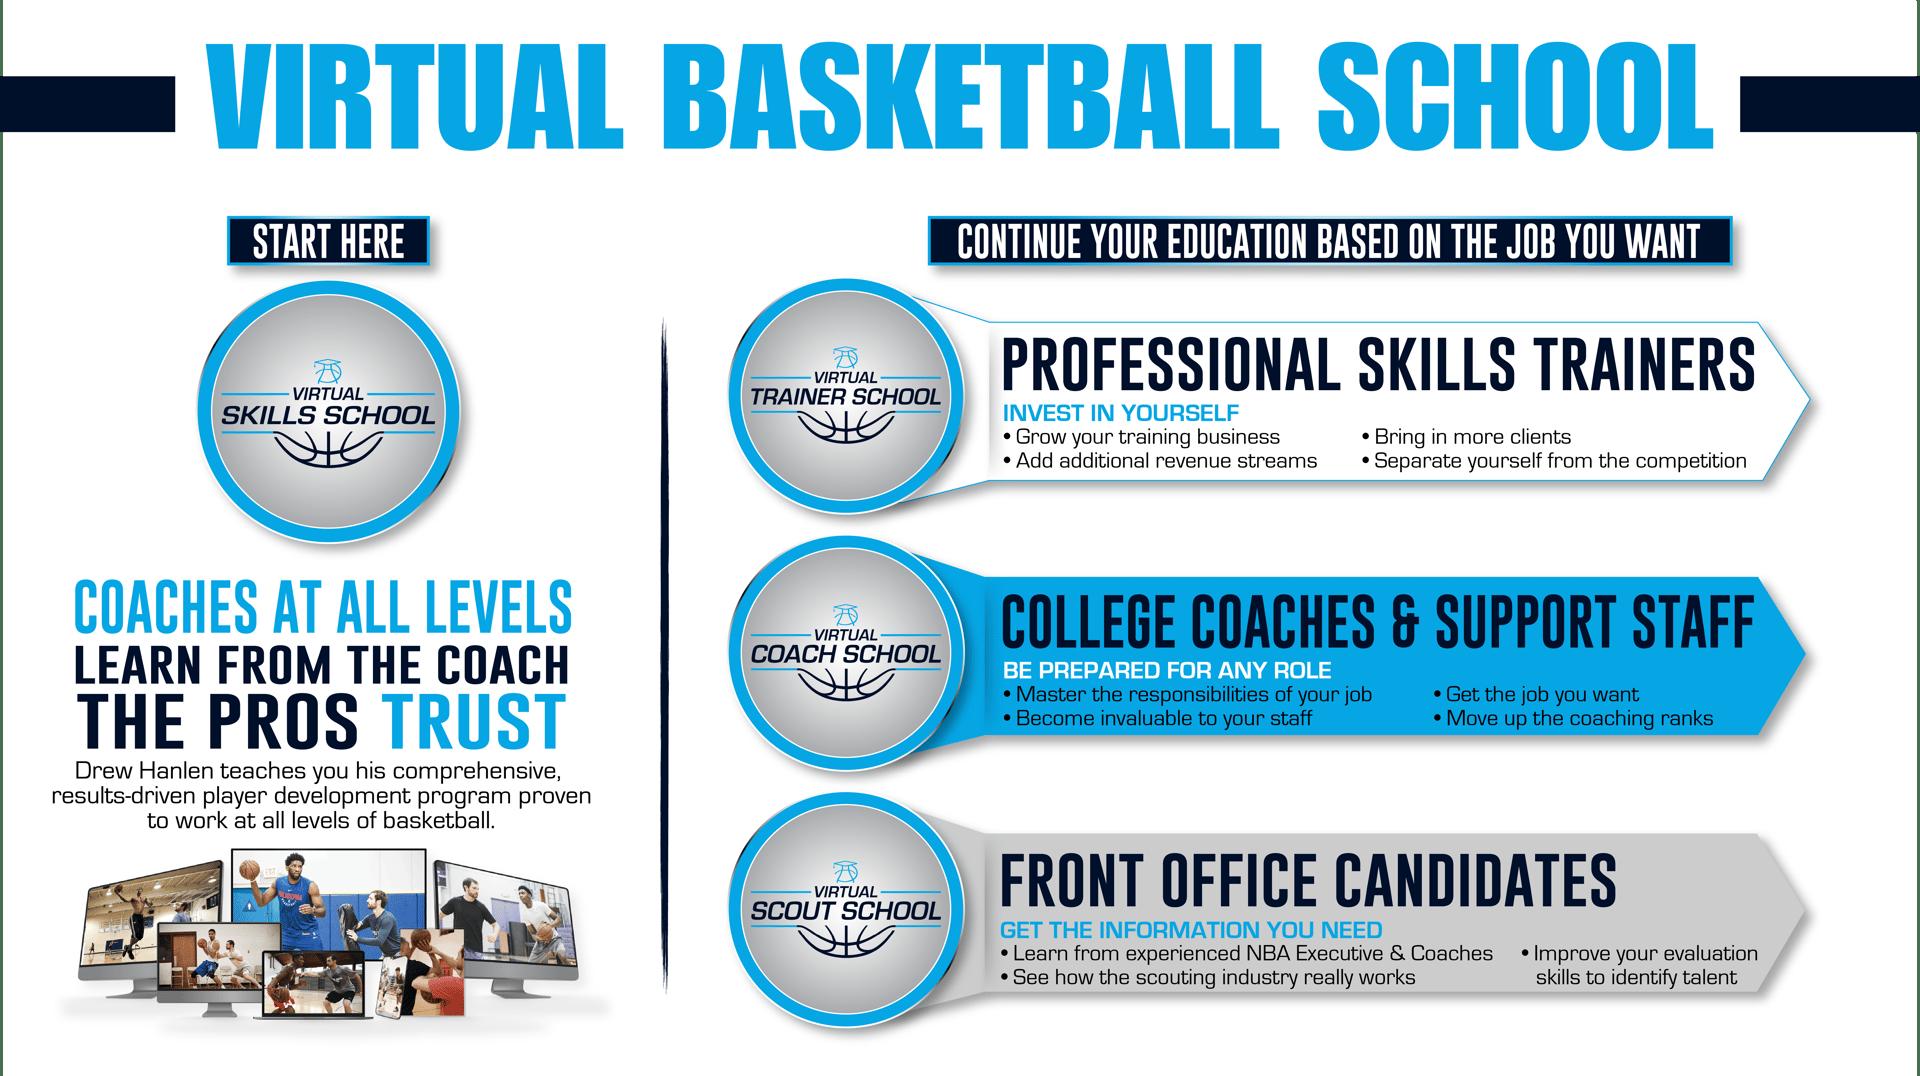 Virtual Basketball School